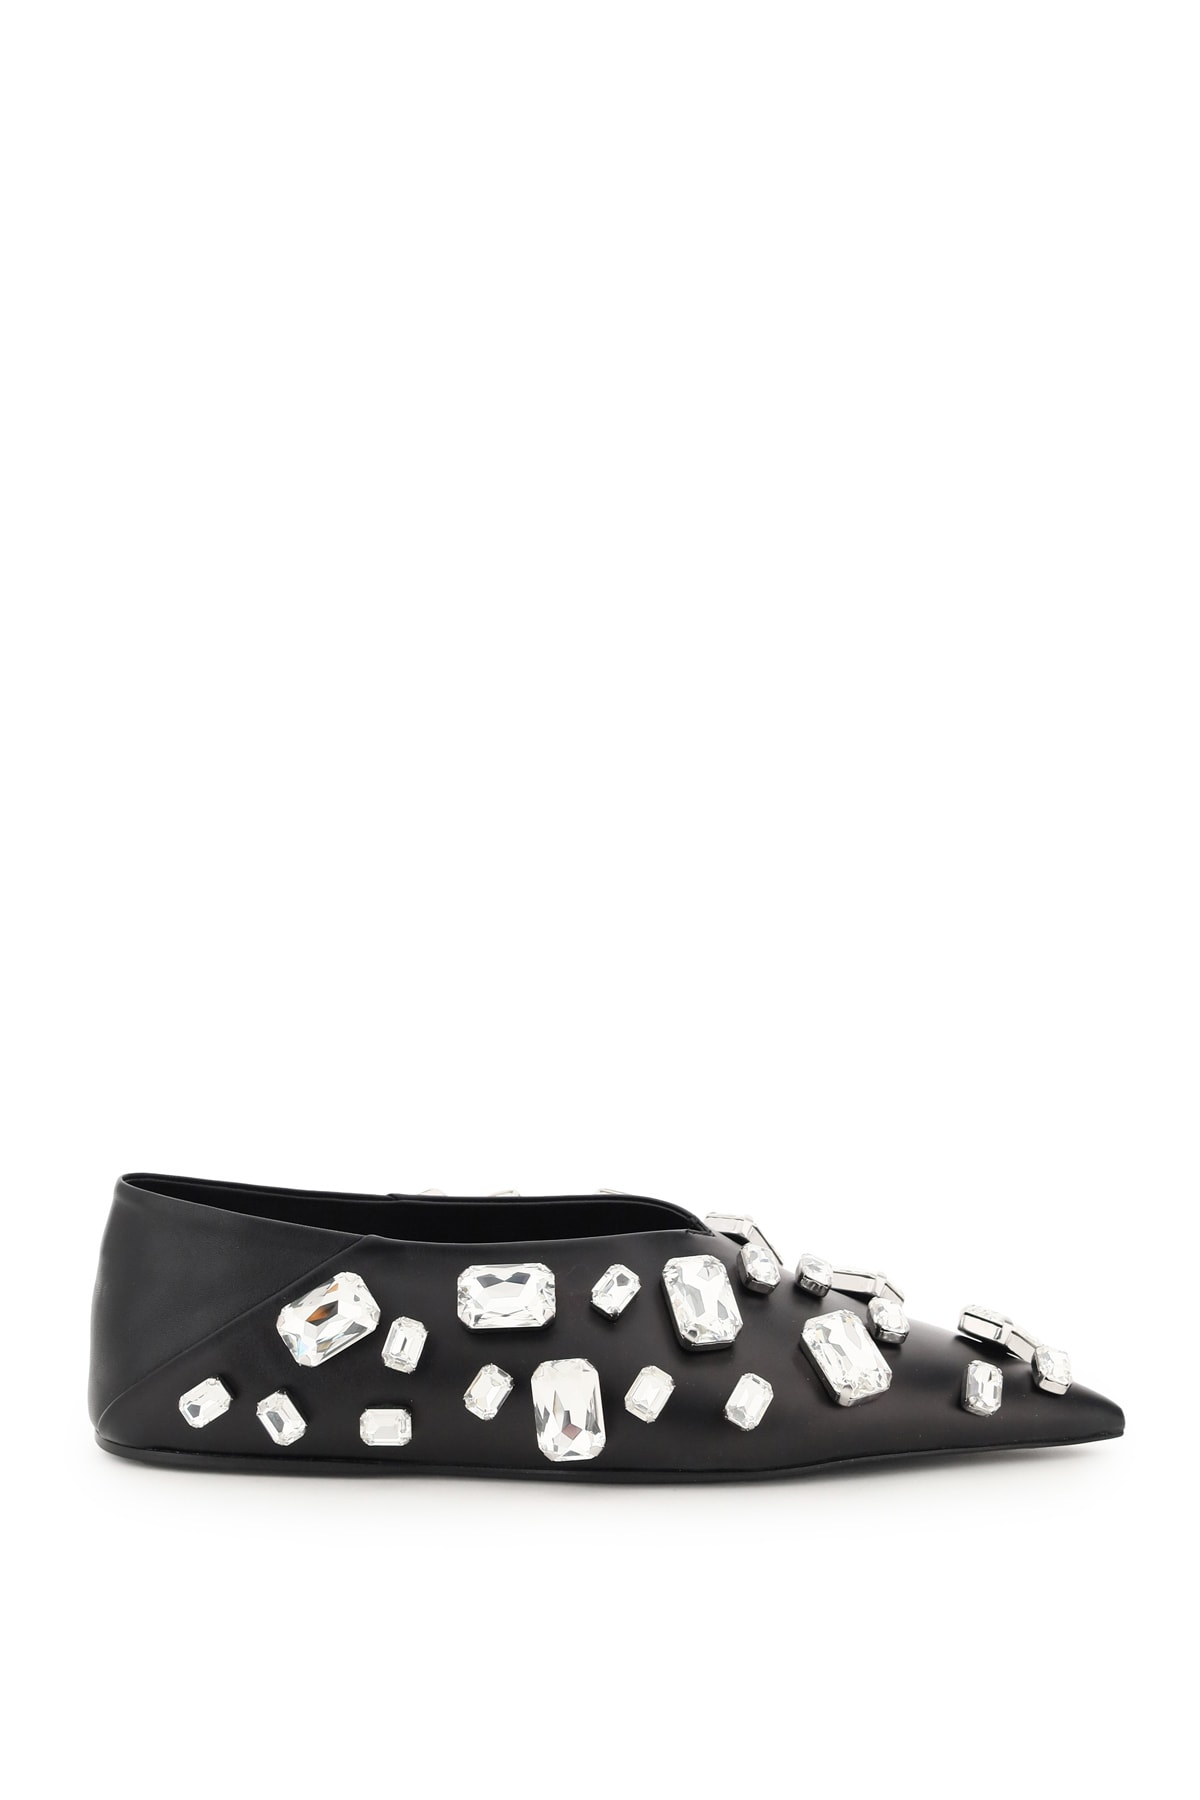 Buy Jil Sander Jewel Leather Ballet Flats online, shop Jil Sander shoes with free shipping